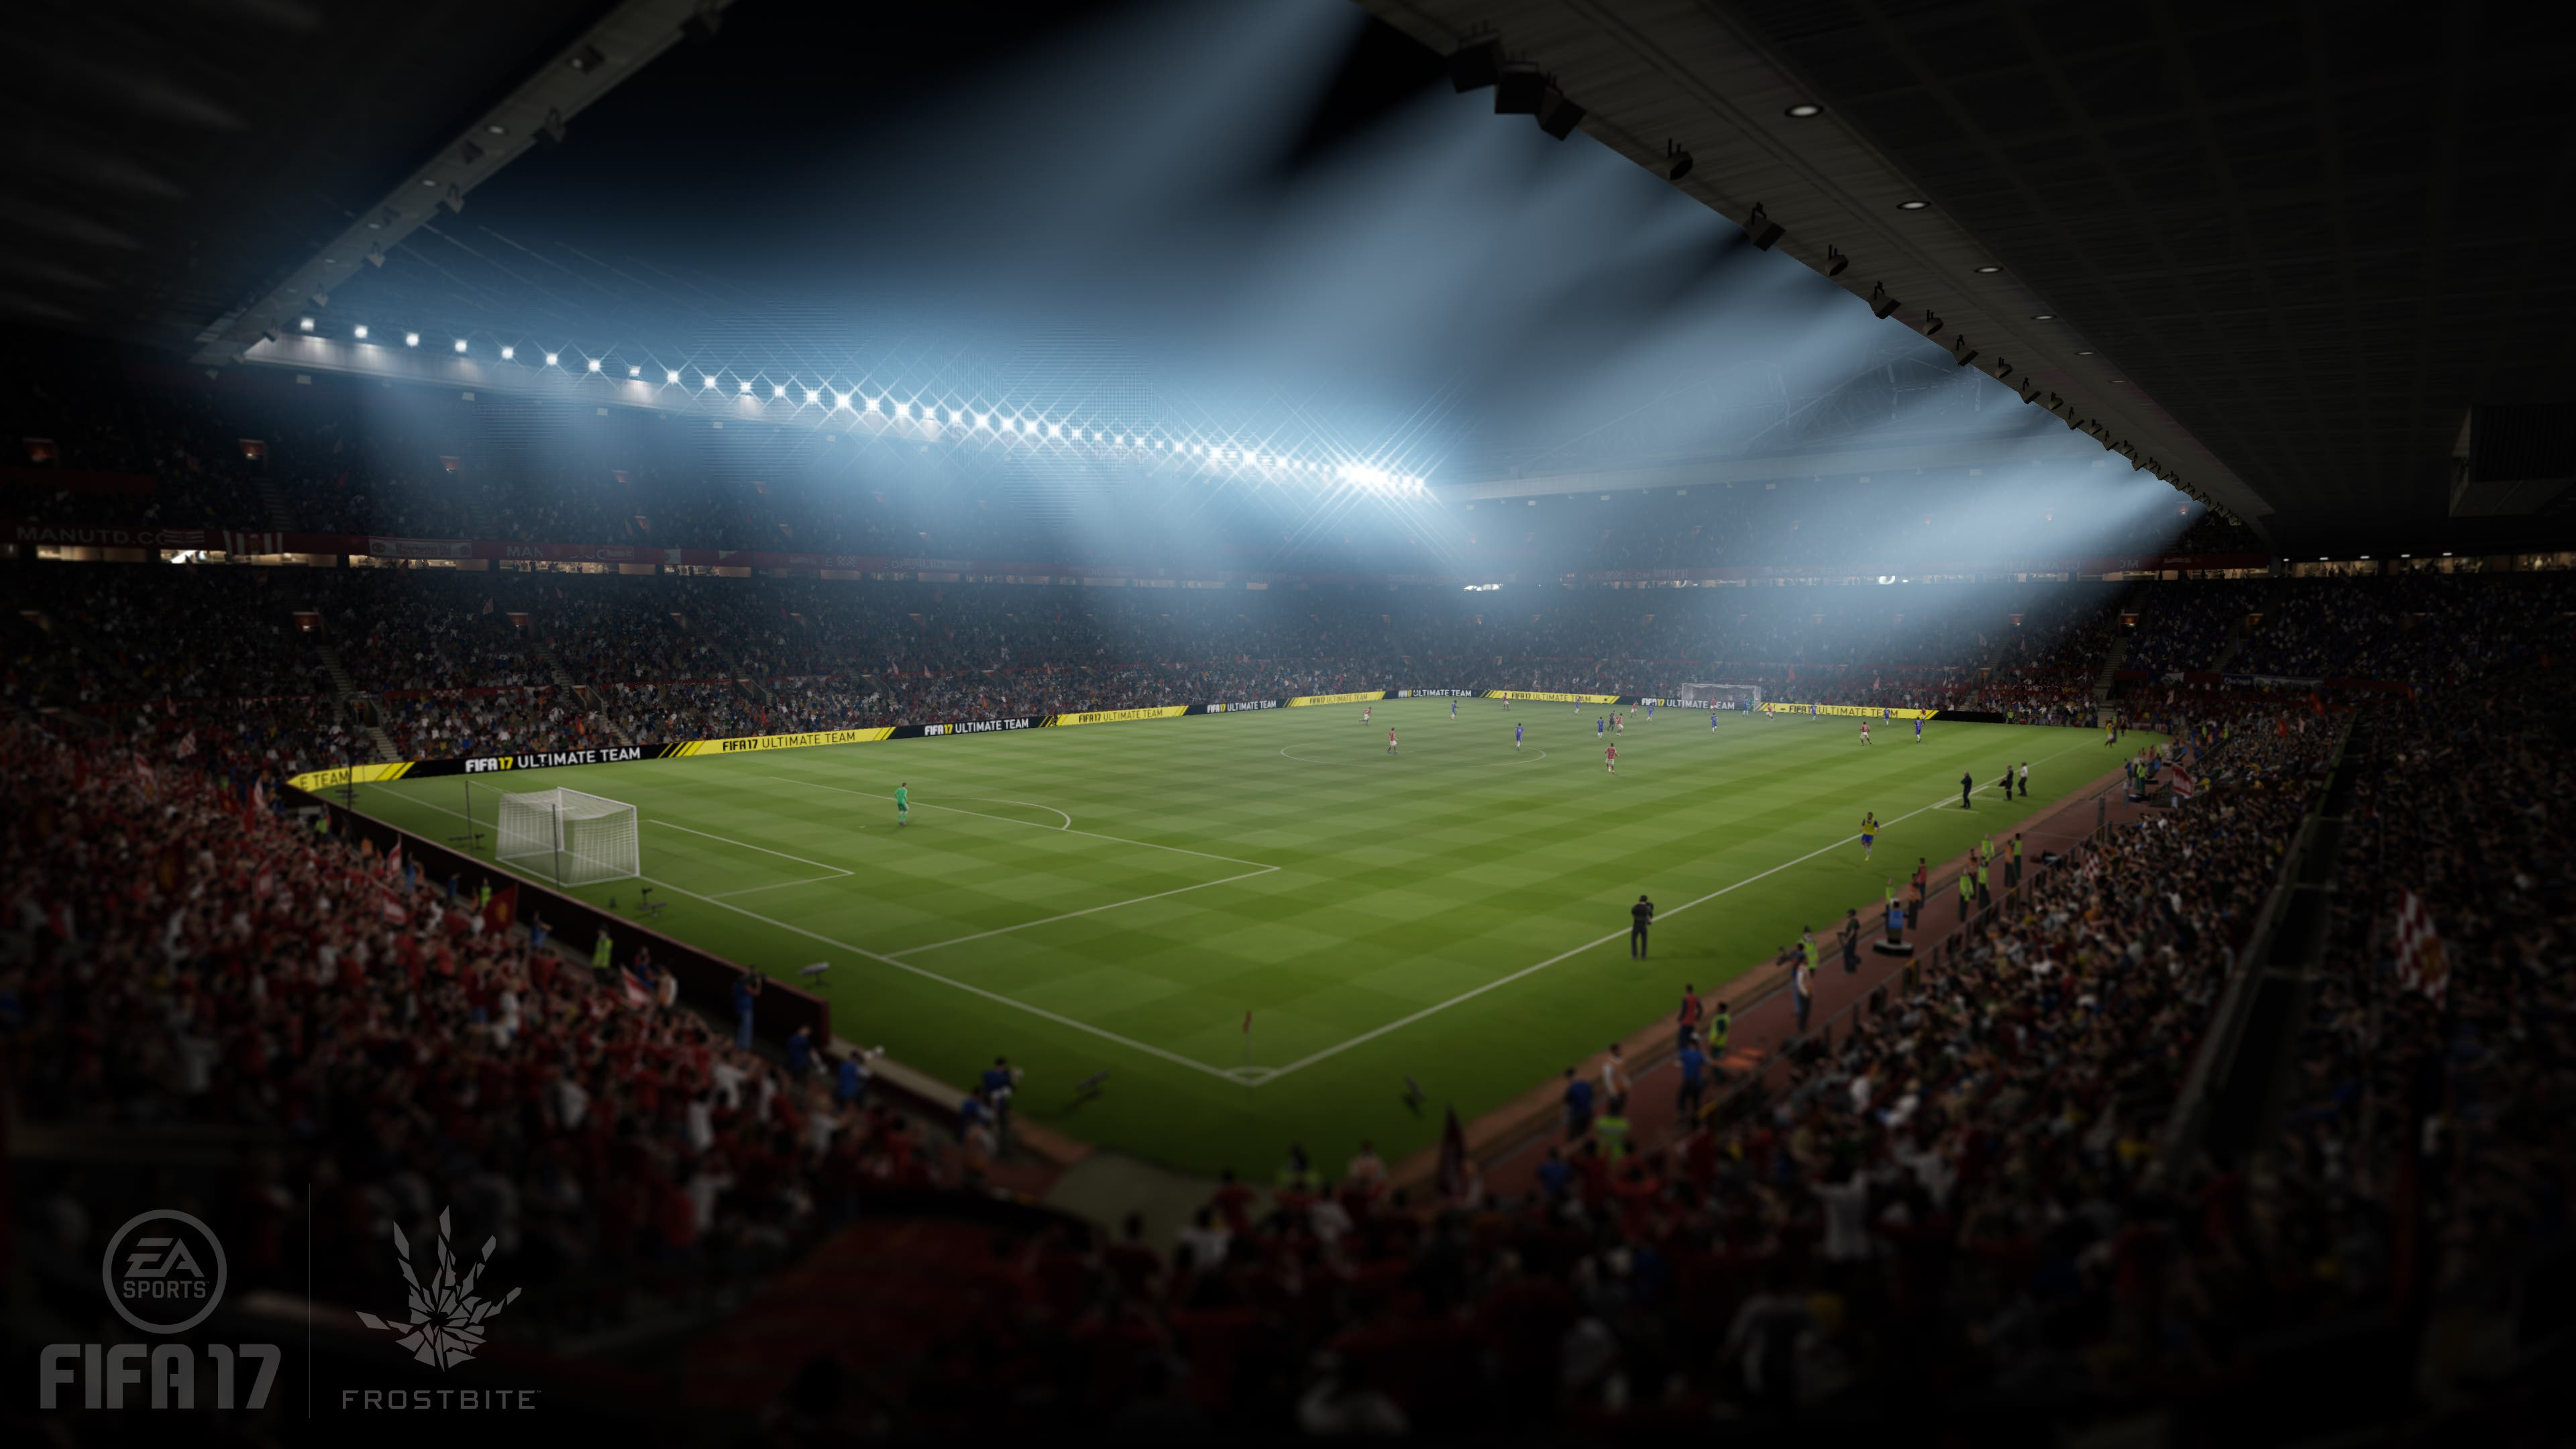 FIFA17_XB1_PS4_EAPLAY_OLD_TRAFFORD_WM_HI_RES